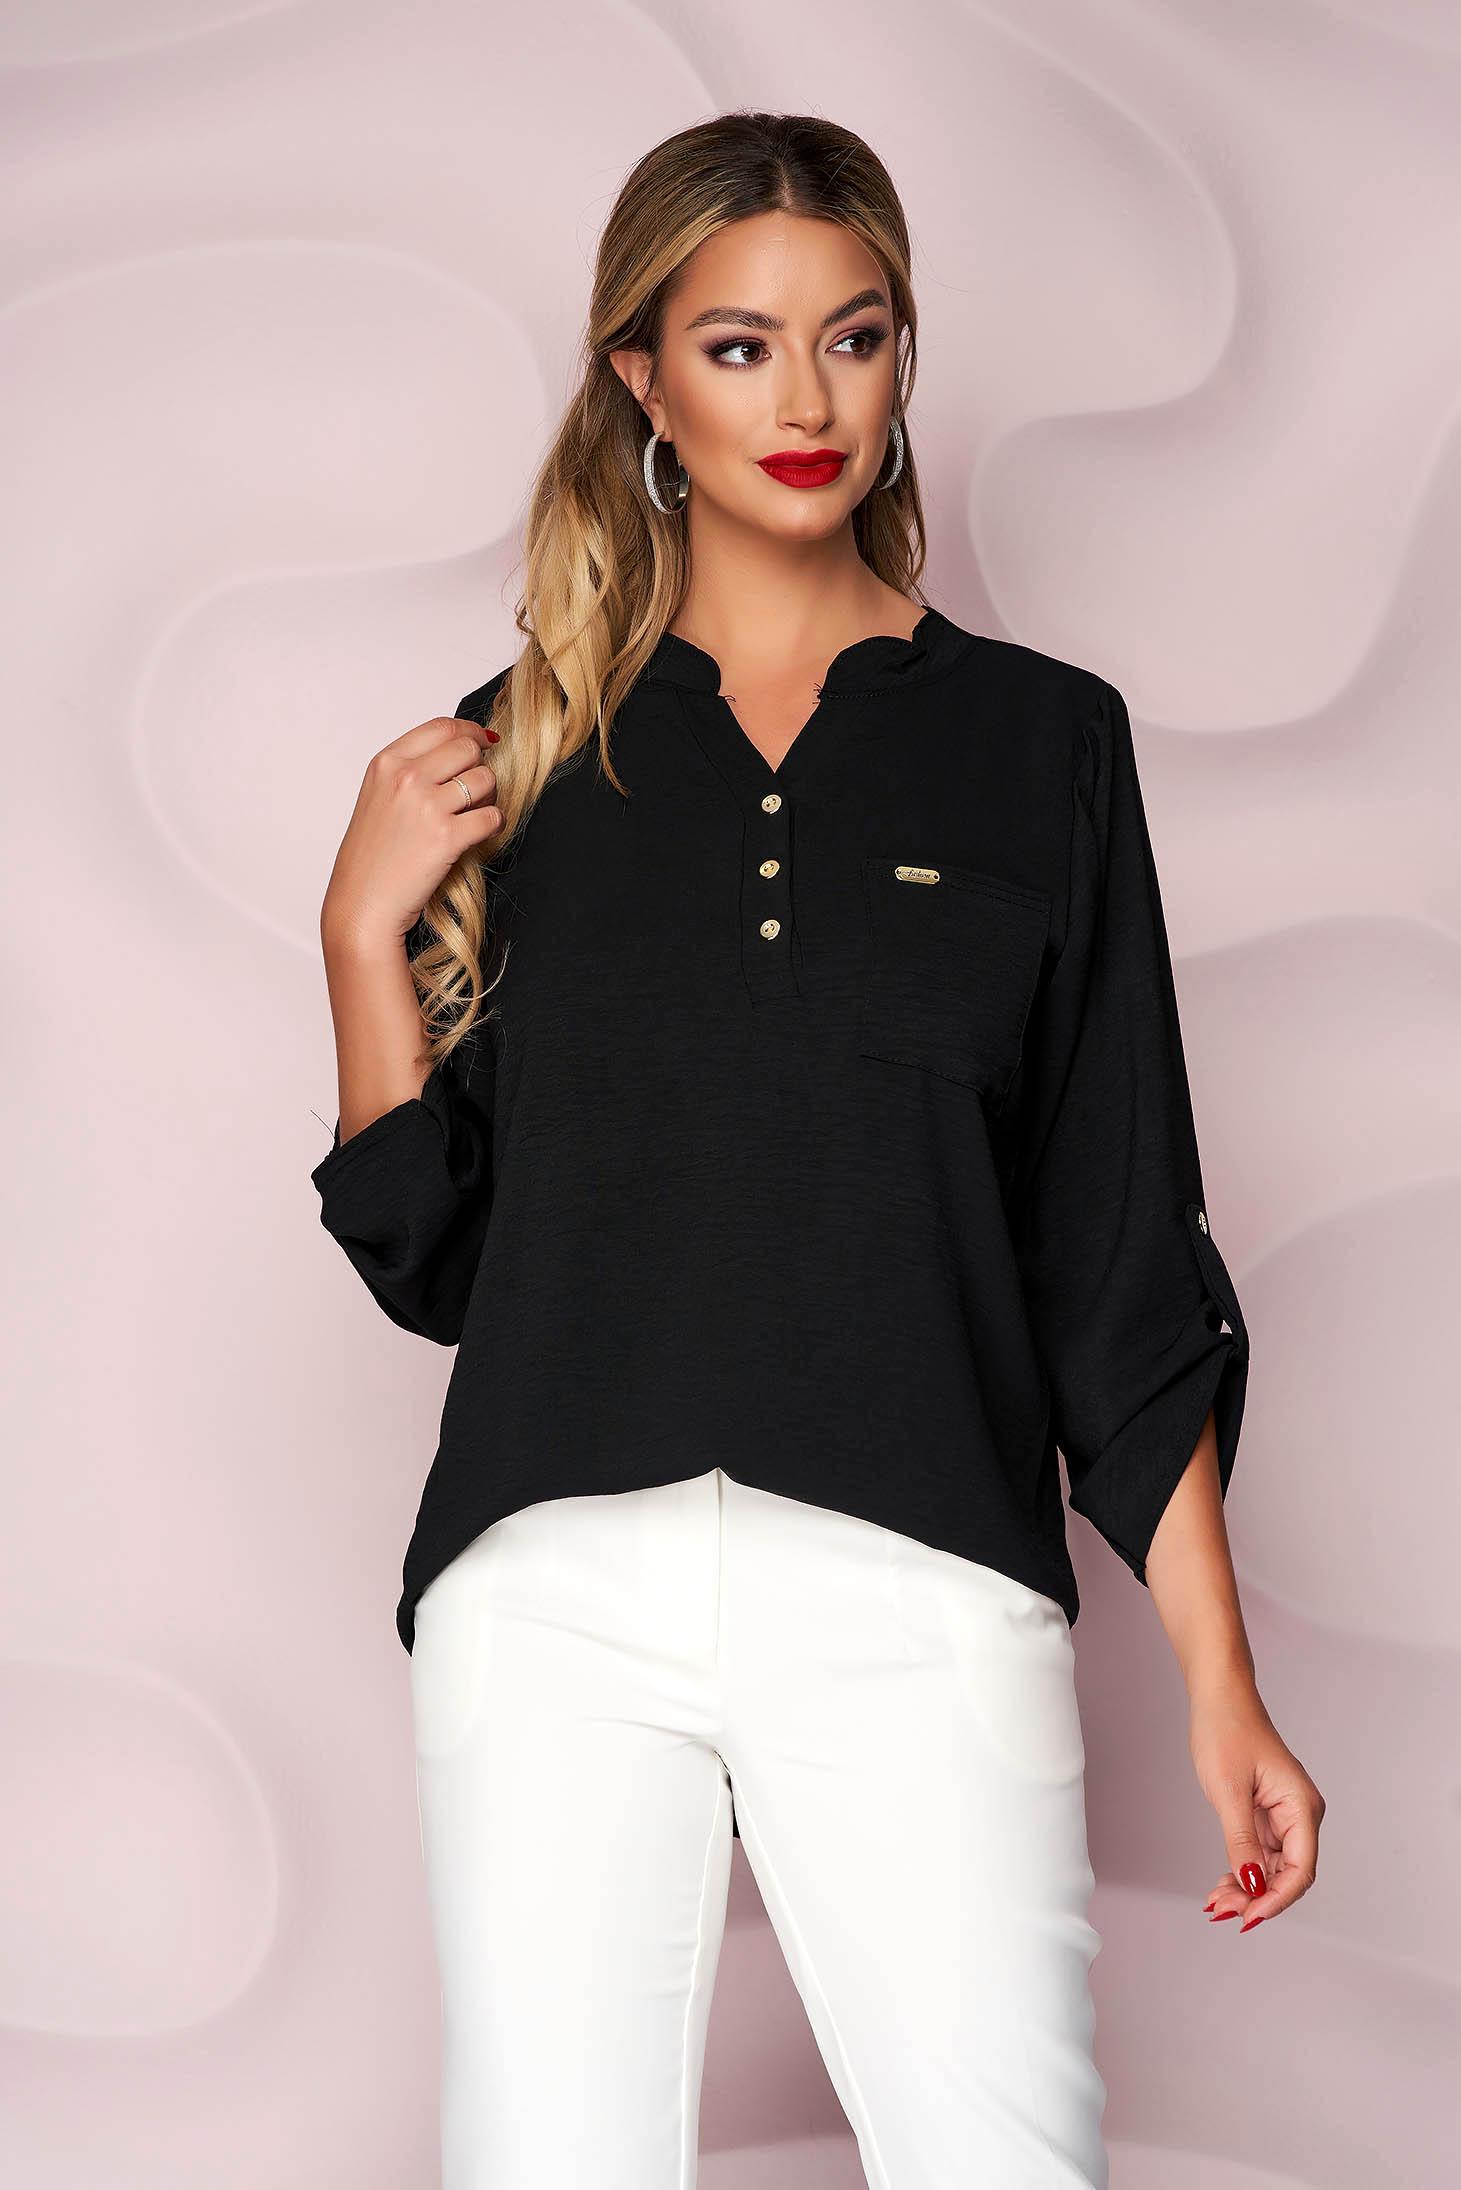 Black women`s blouse loose fit wrinkled material a front pocket